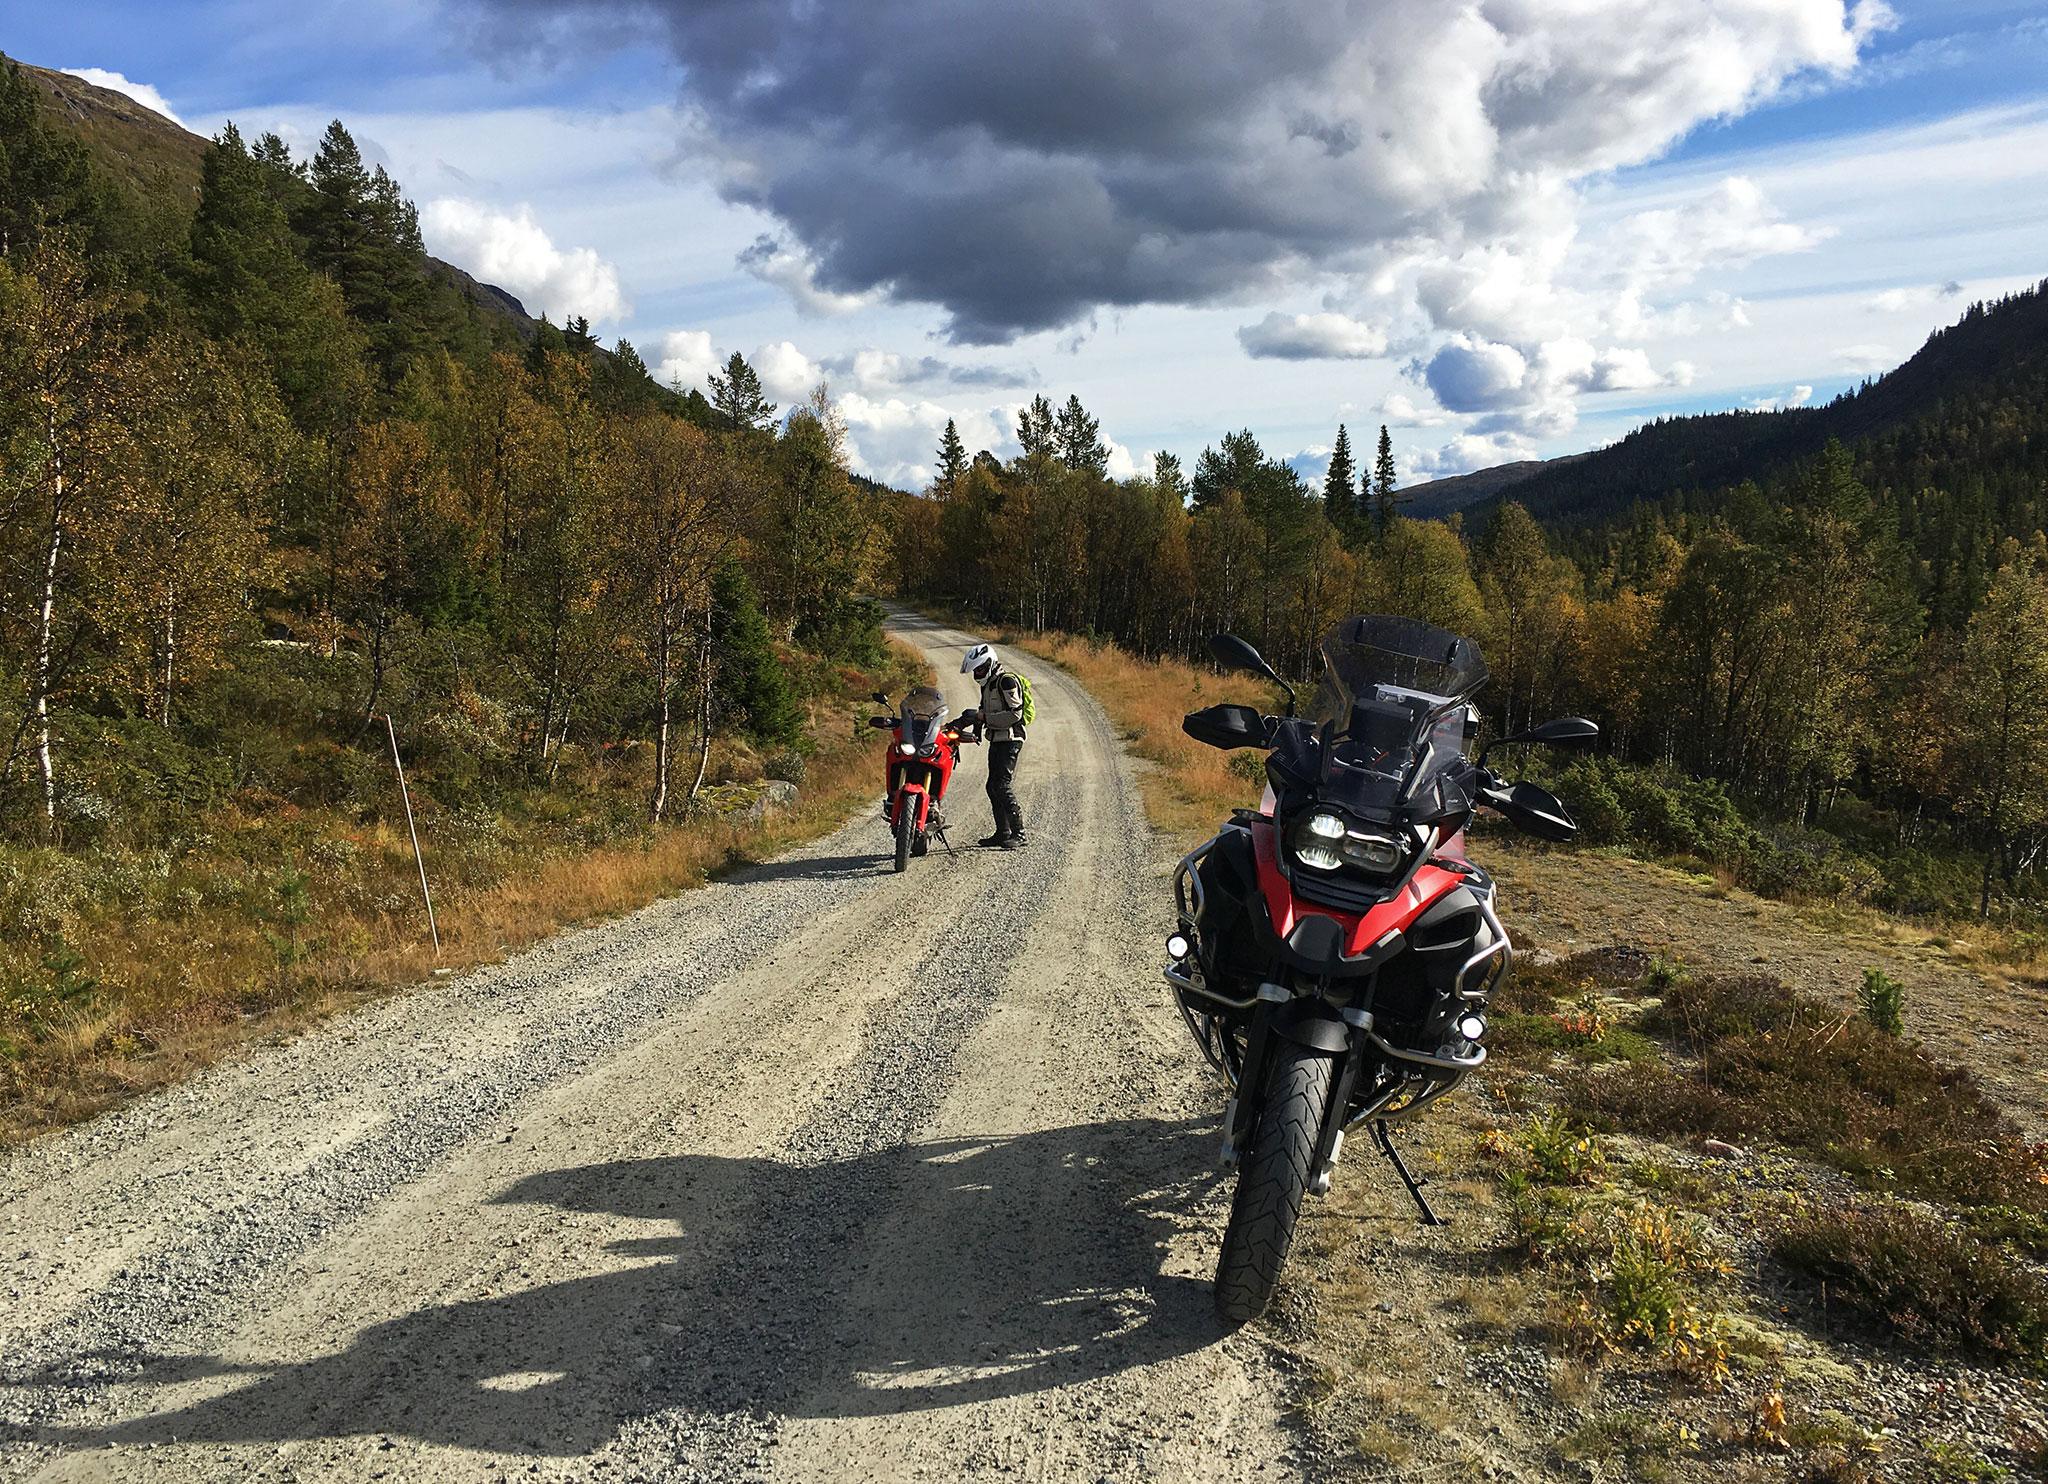 Gravel roads Norwegian style